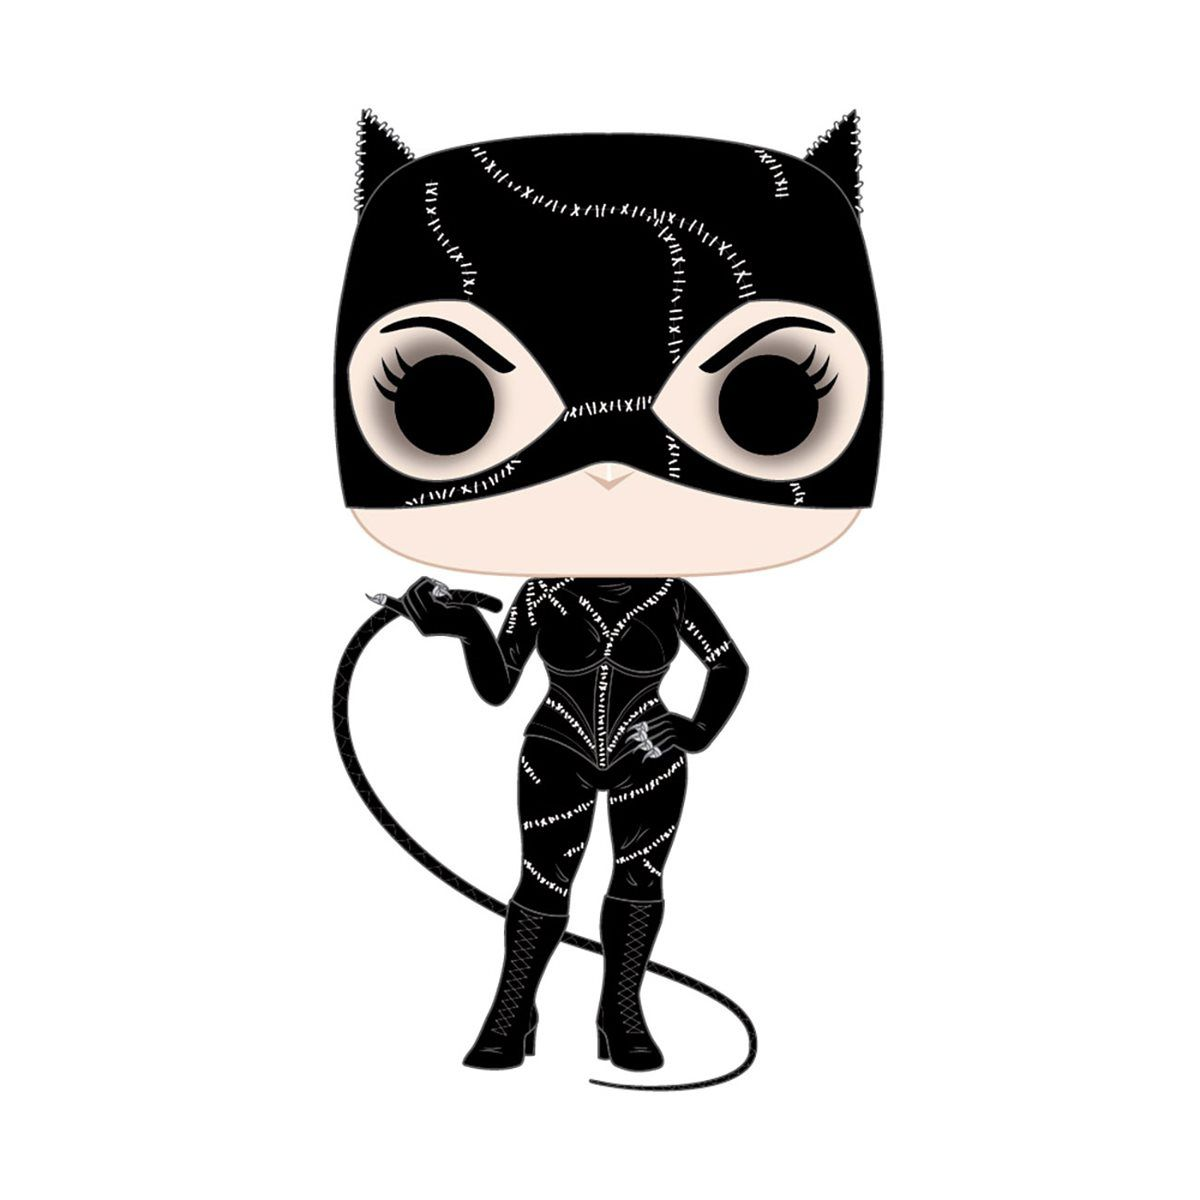 PRÉ VENDA: Funko Pop! Mulher Gato (Catwoman): Batman - O Retorno (Batman Returns) #338 - Funko